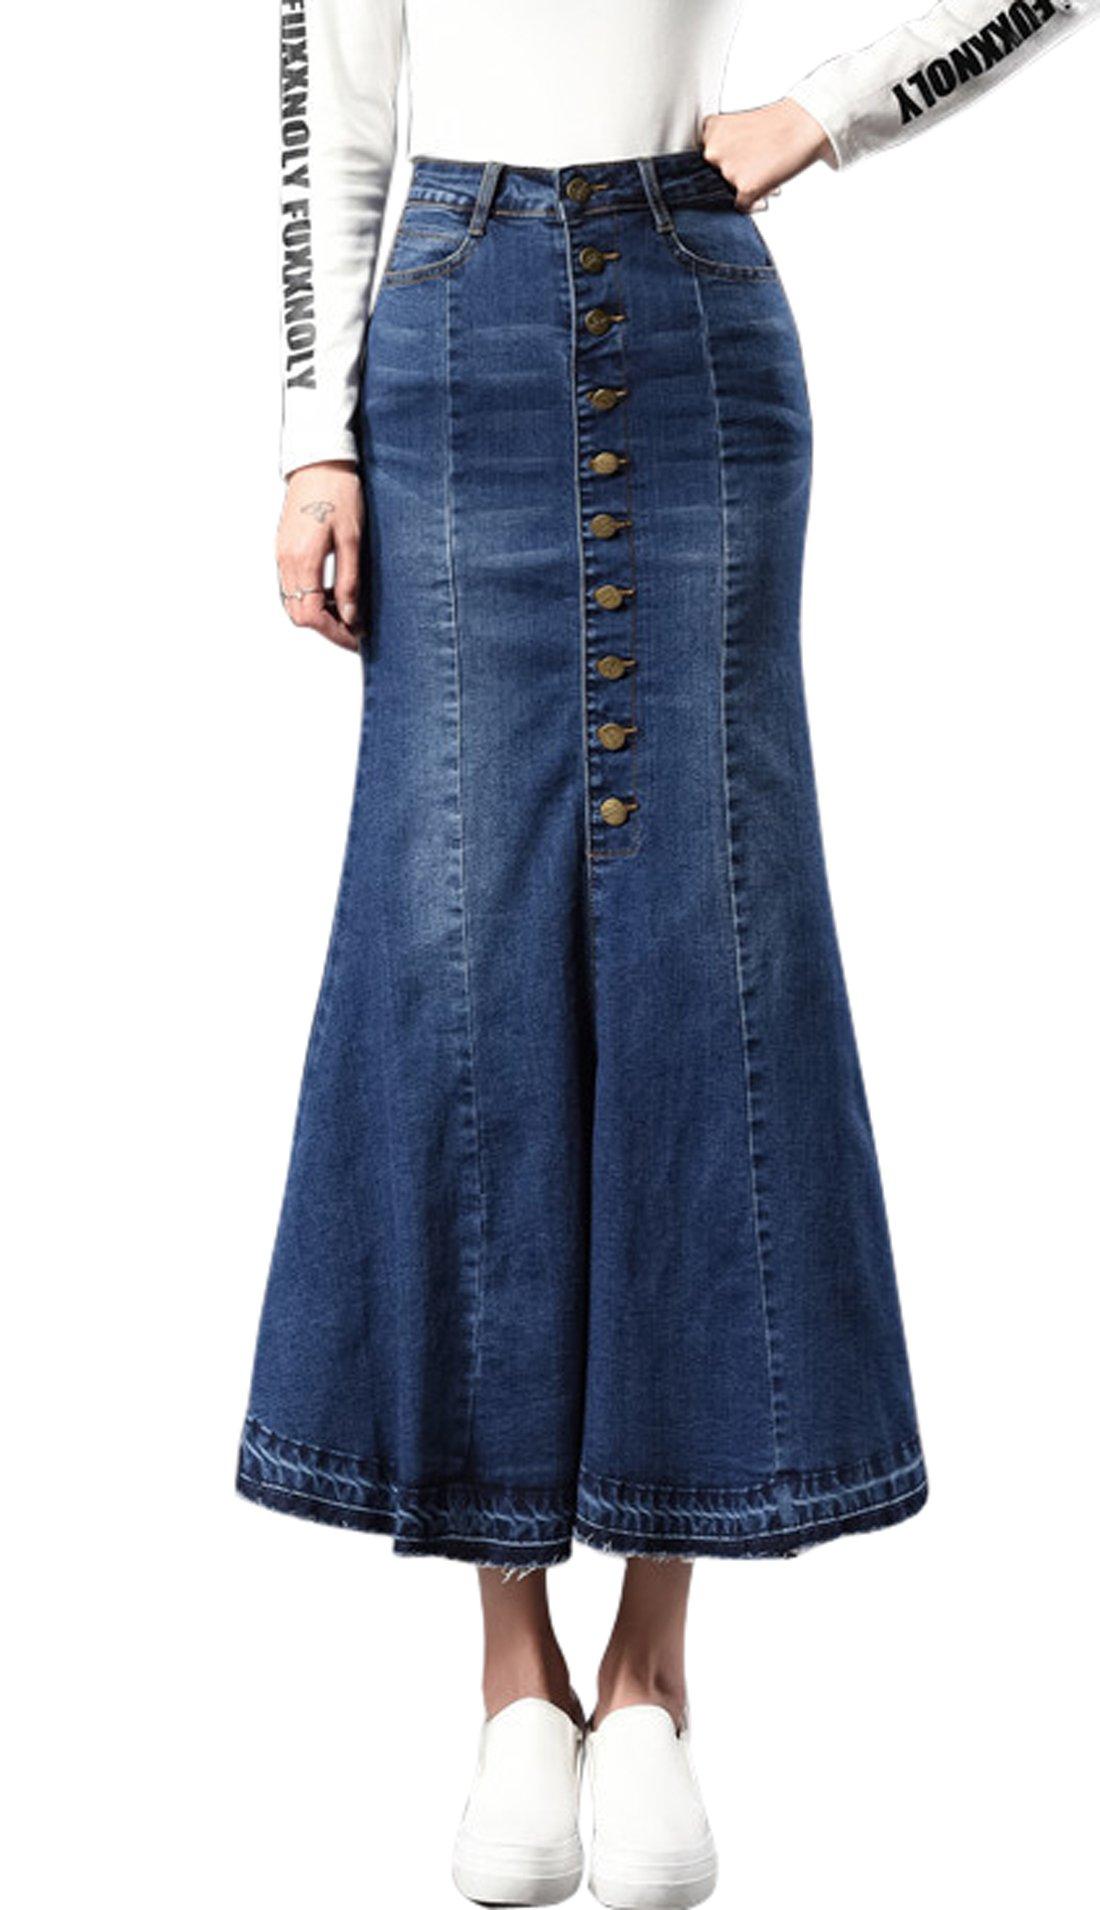 Chouyatou Women's Casual Stretch High Waisted Front Button Long Denim Mermaid Skirt (Medium, Blue)